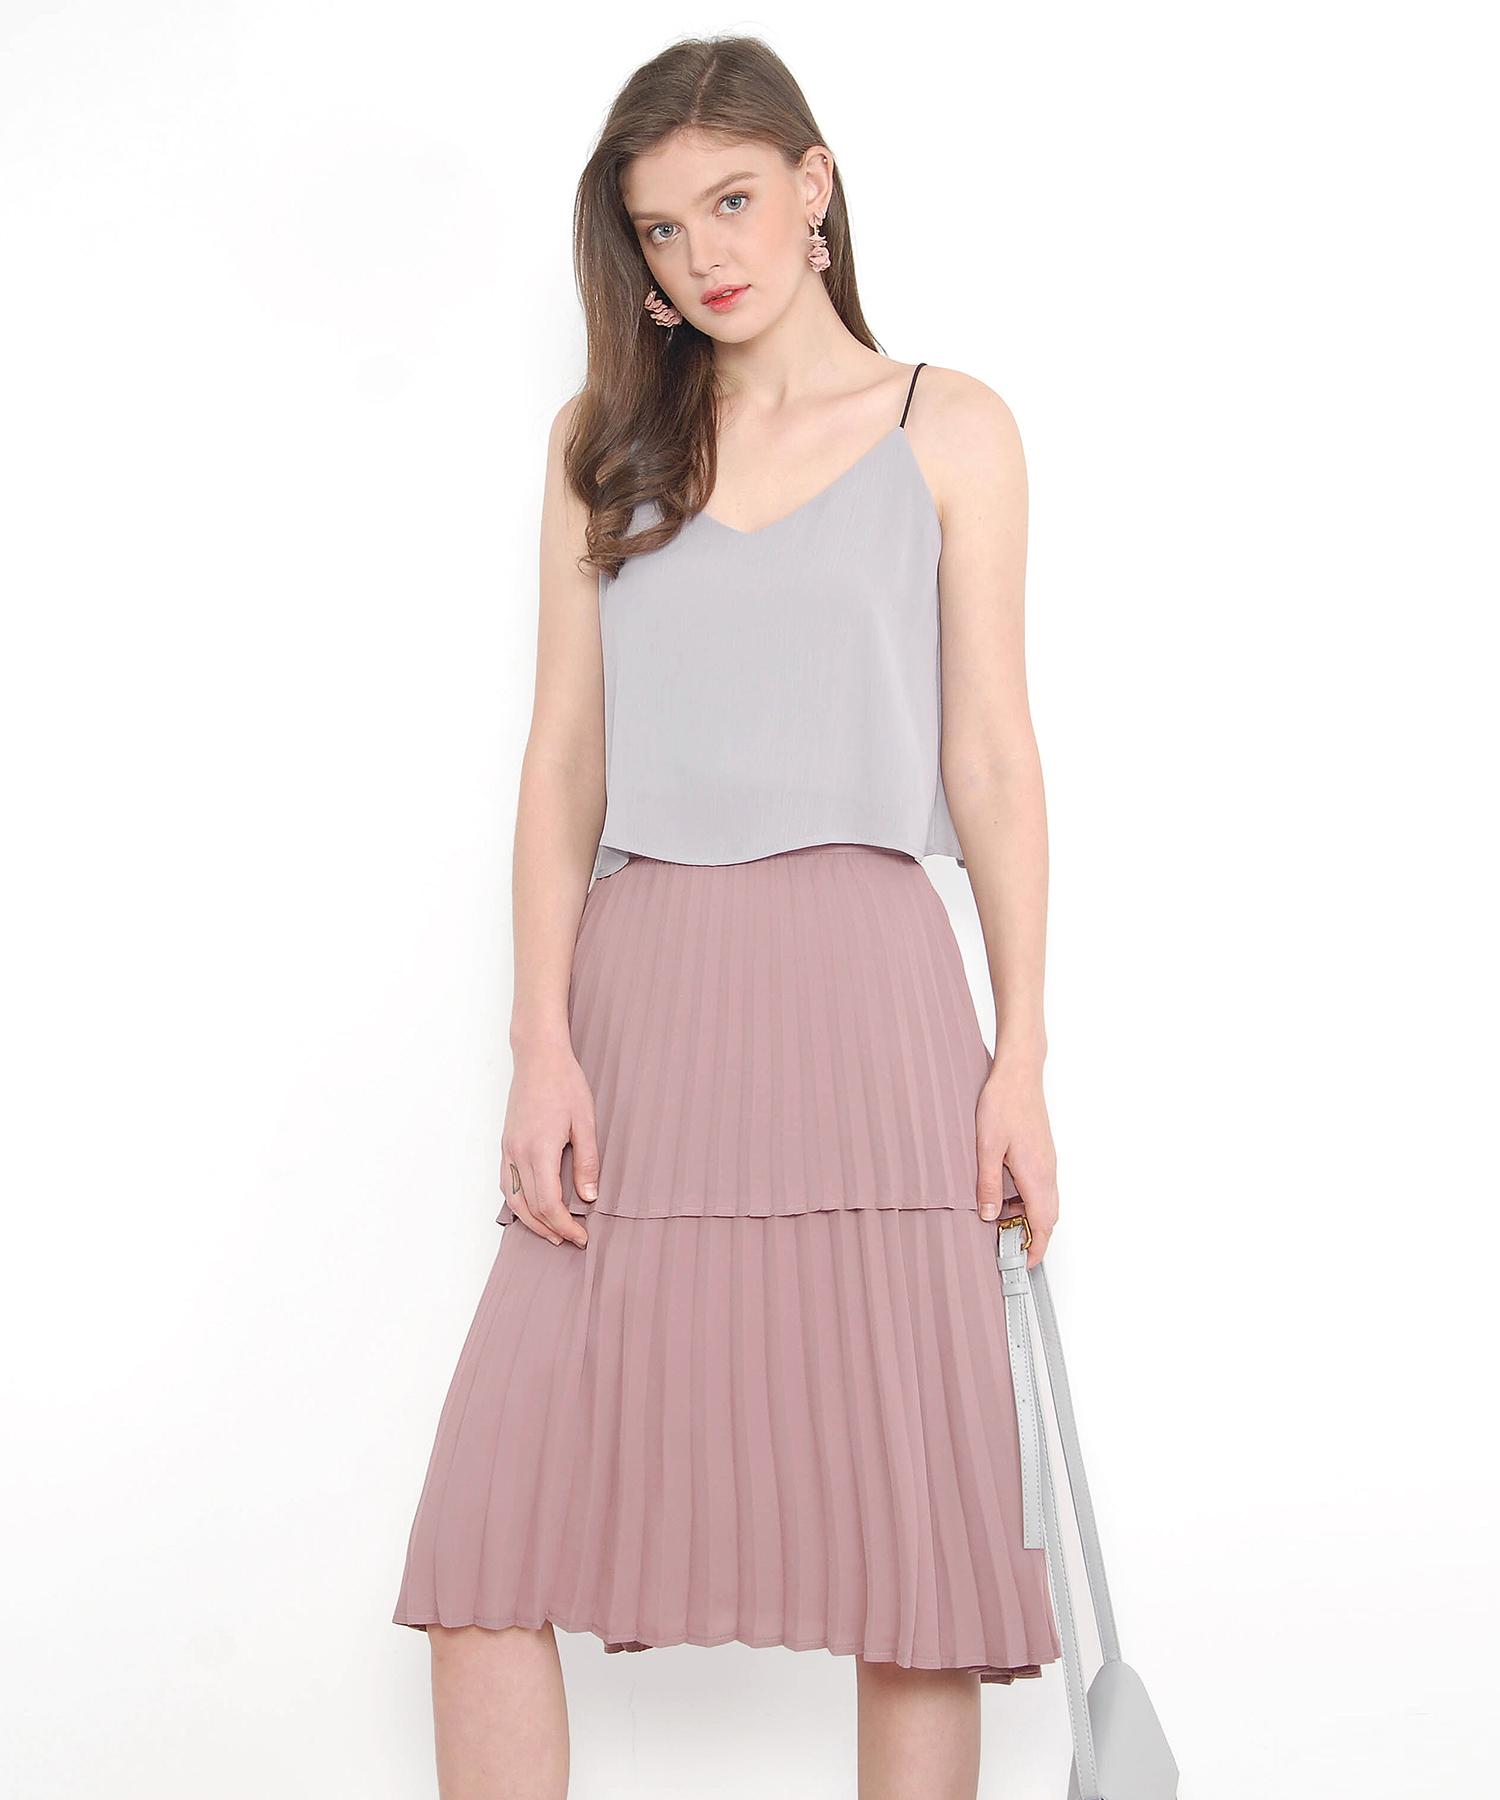 4d49bcde2 Belle Tiered Pleated Skirt - Mauve | hervelvetvase